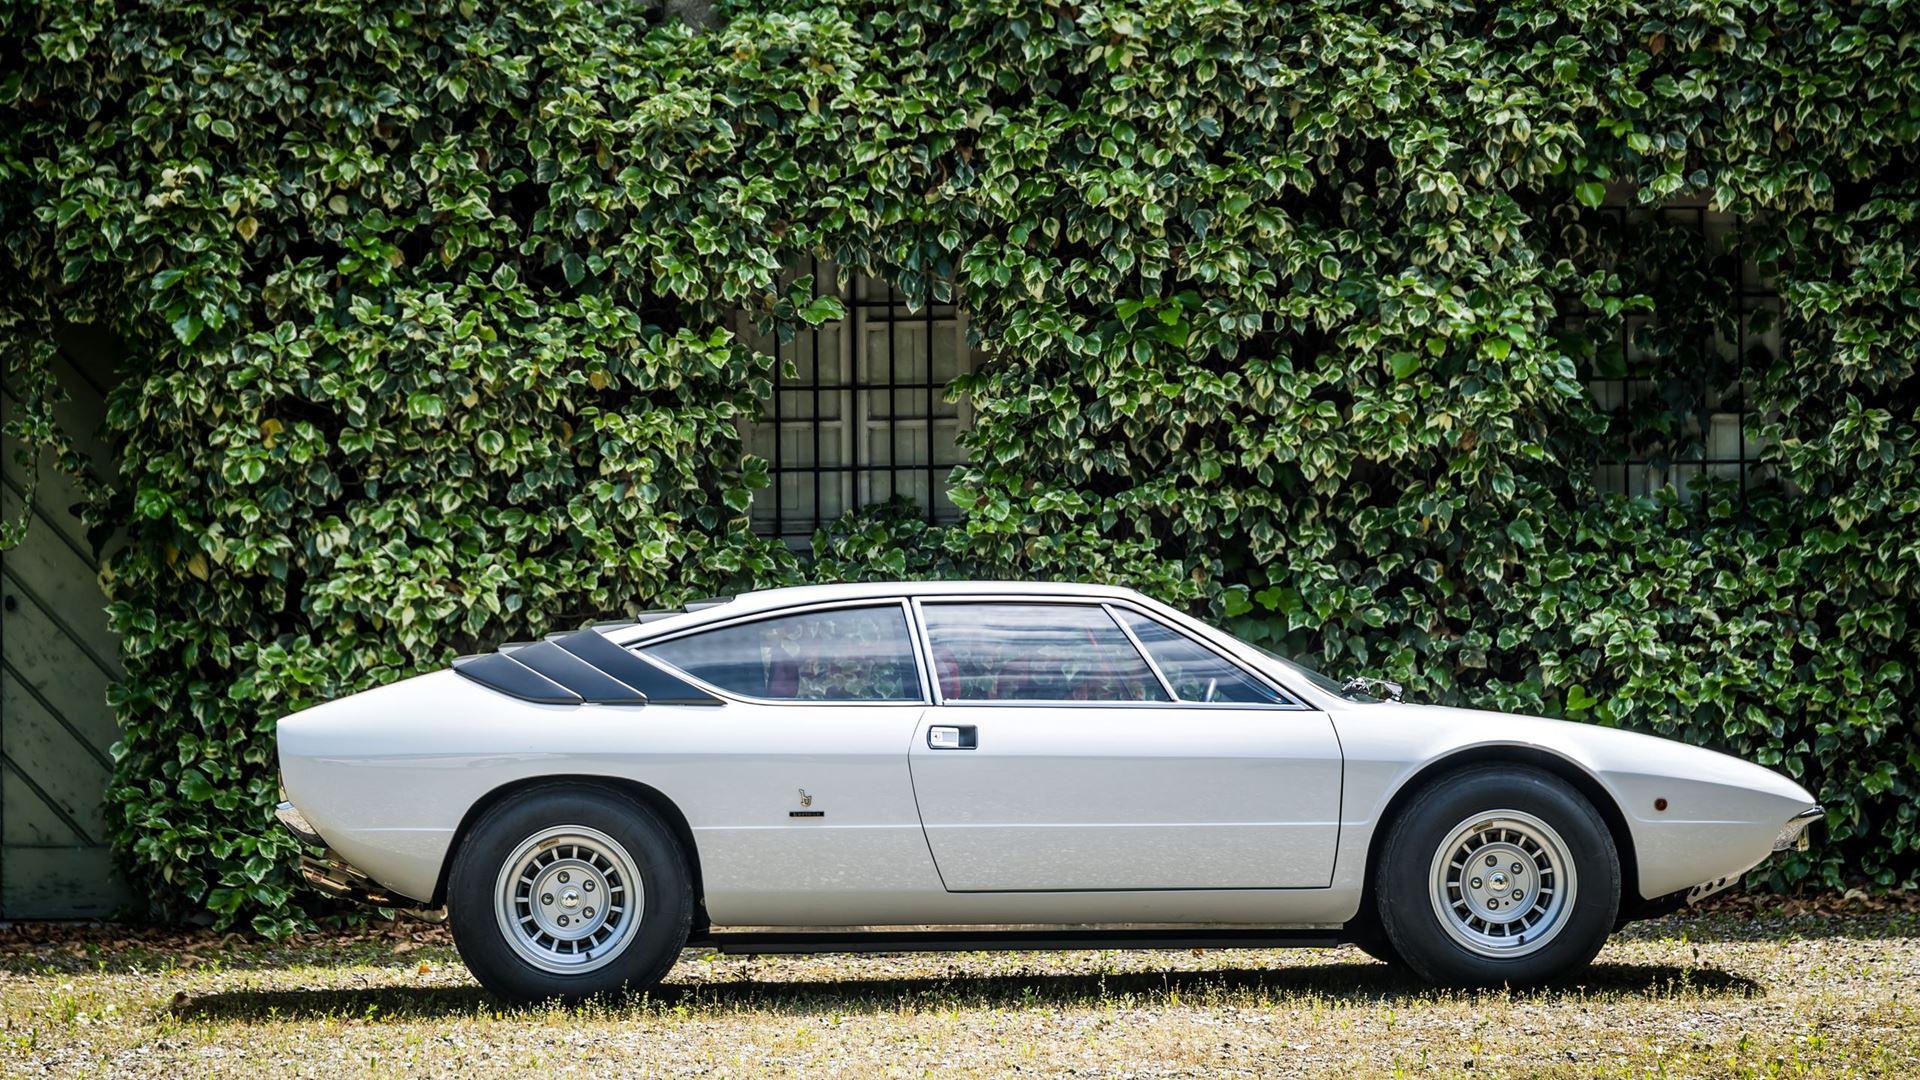 Lamborghini celebrates the 50th Anniversary of the Urraco - Image 3